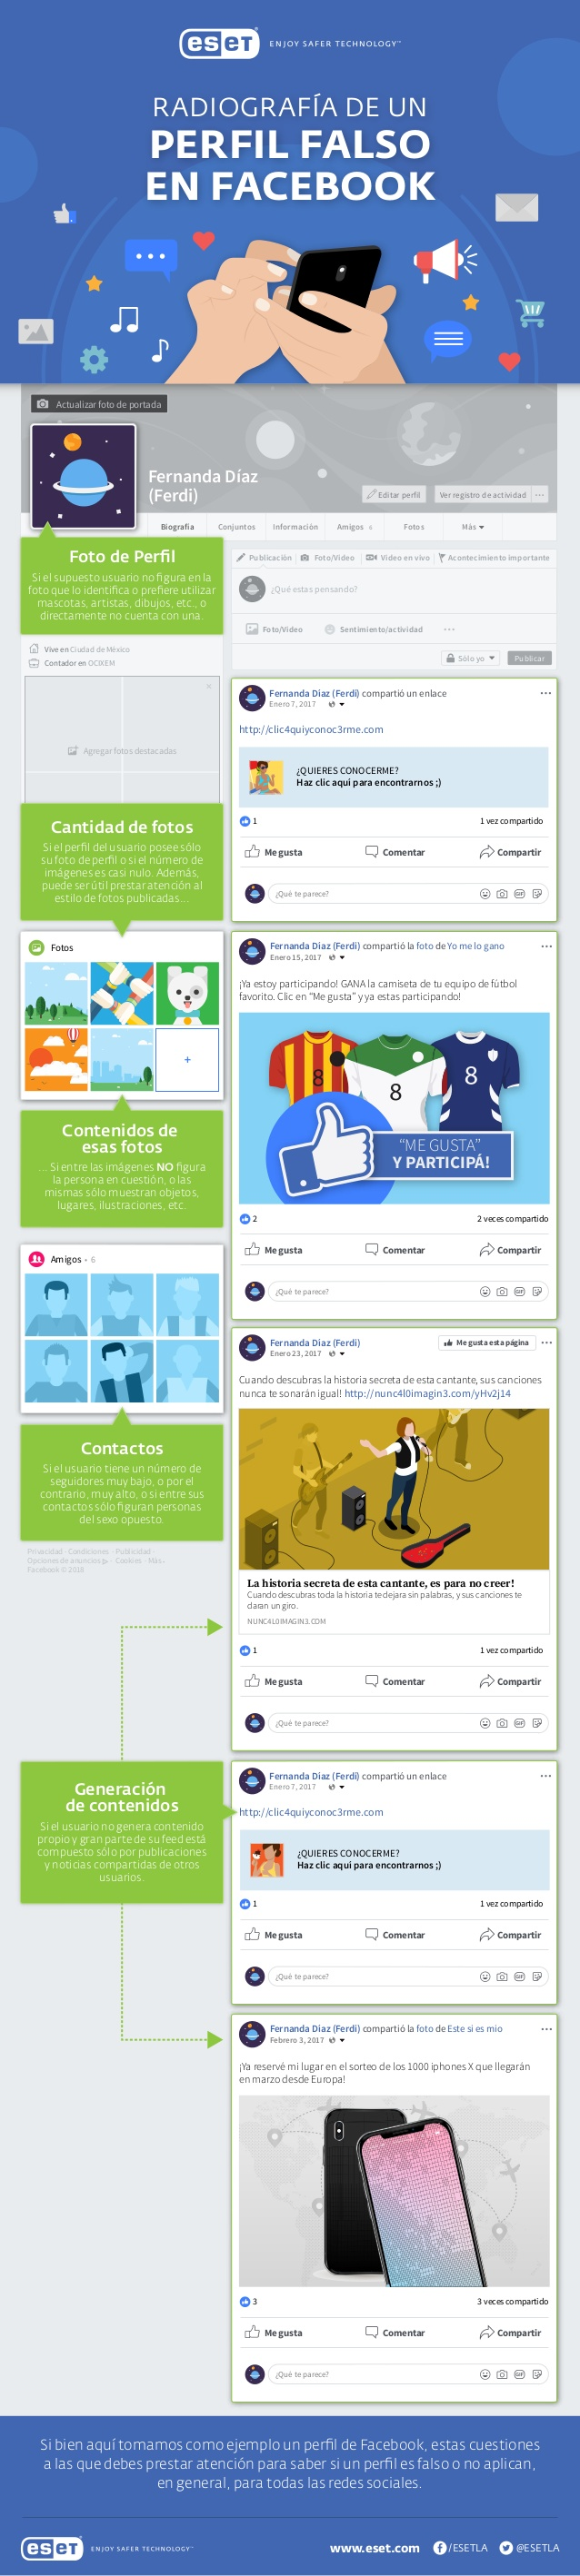 Radiografía de un perfil falso de Facebook